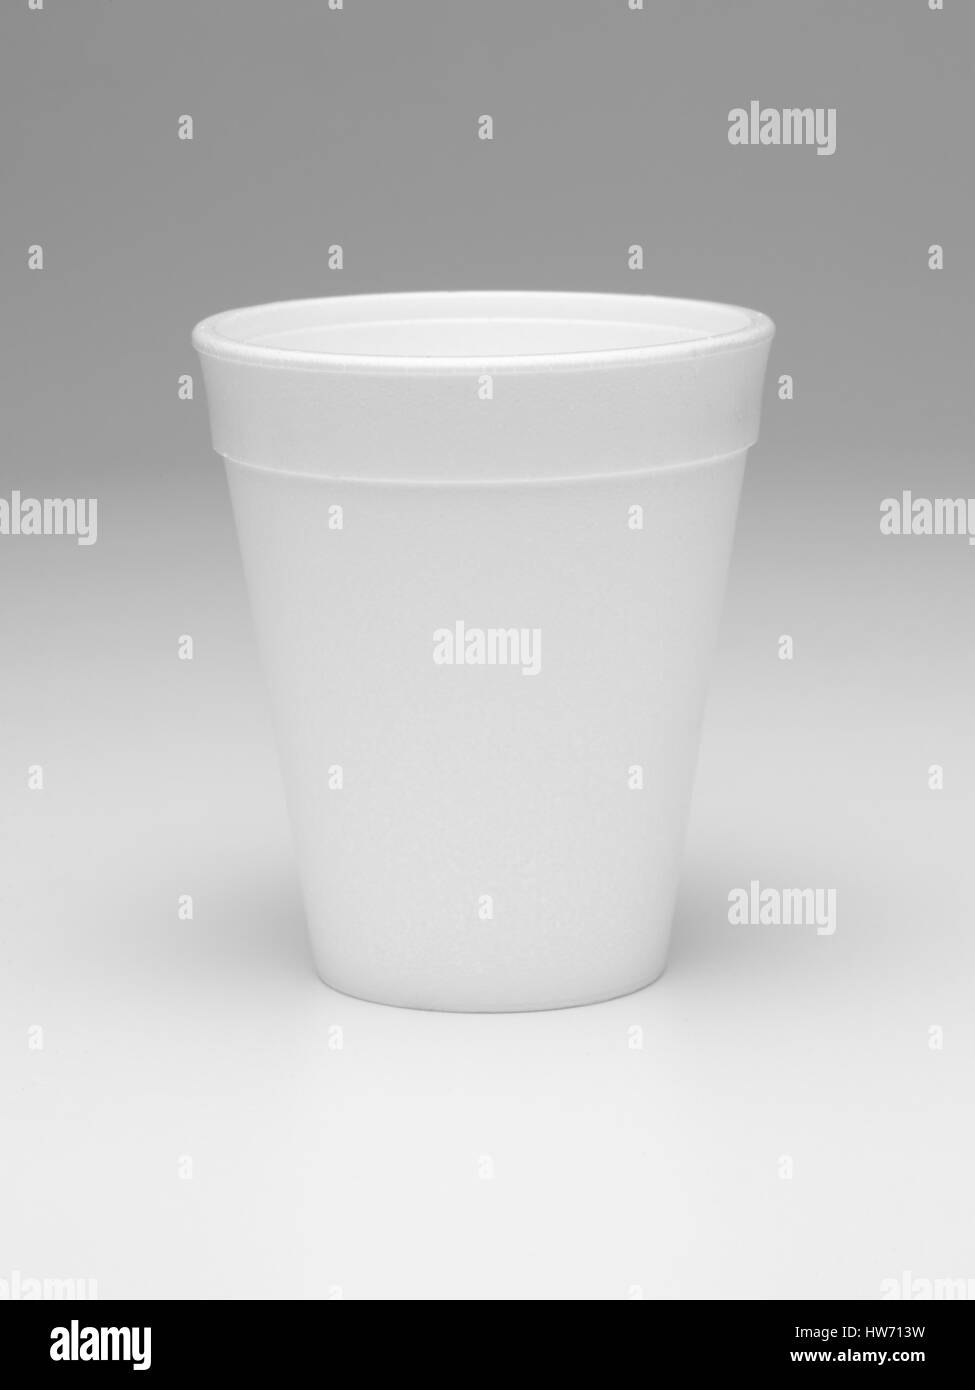 Styrofoam cup aislado Foto de stock